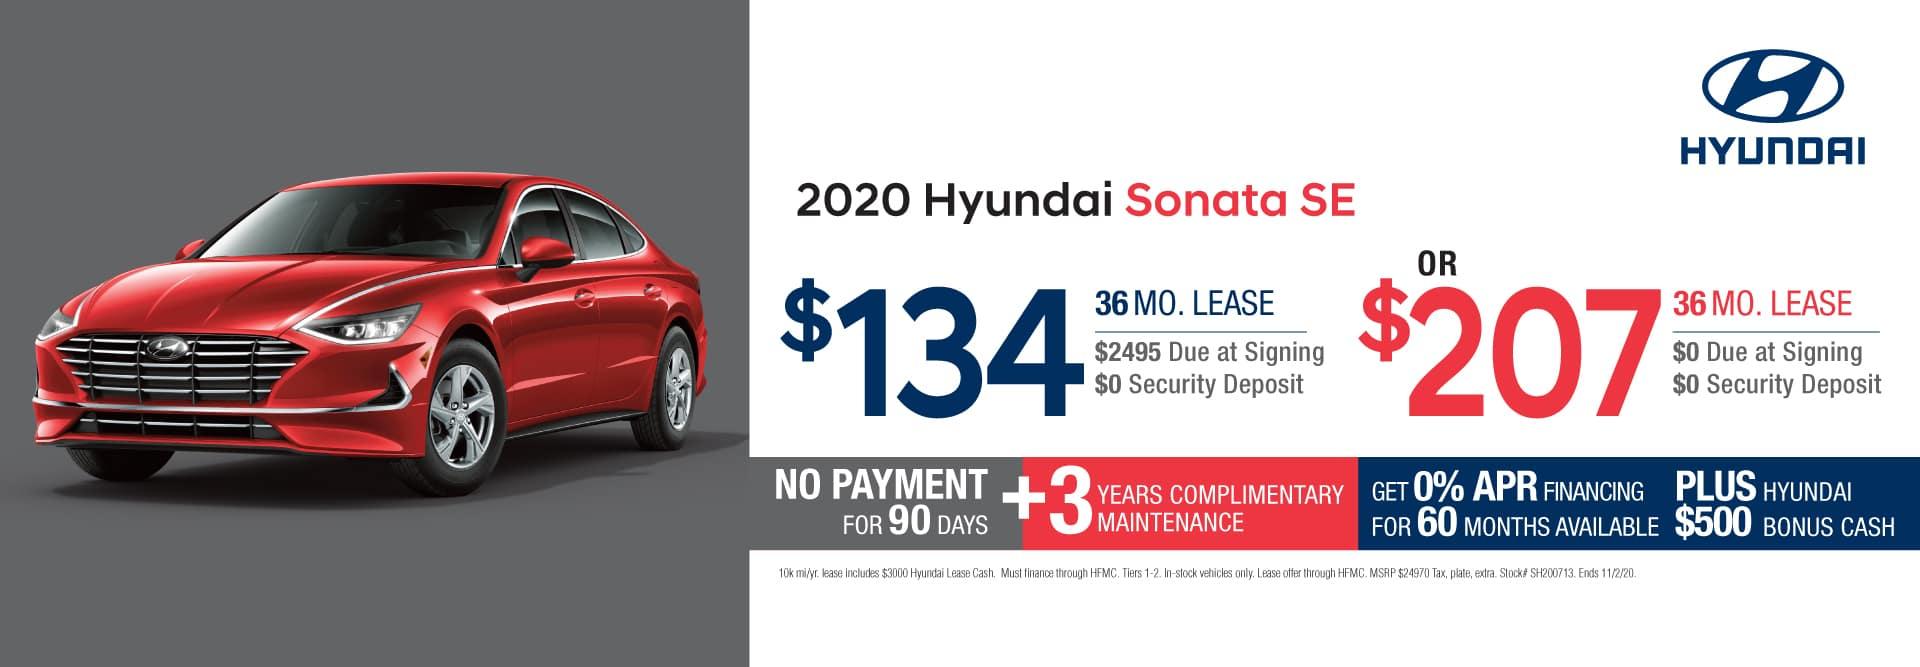 2020-oct-sonata-3-1021